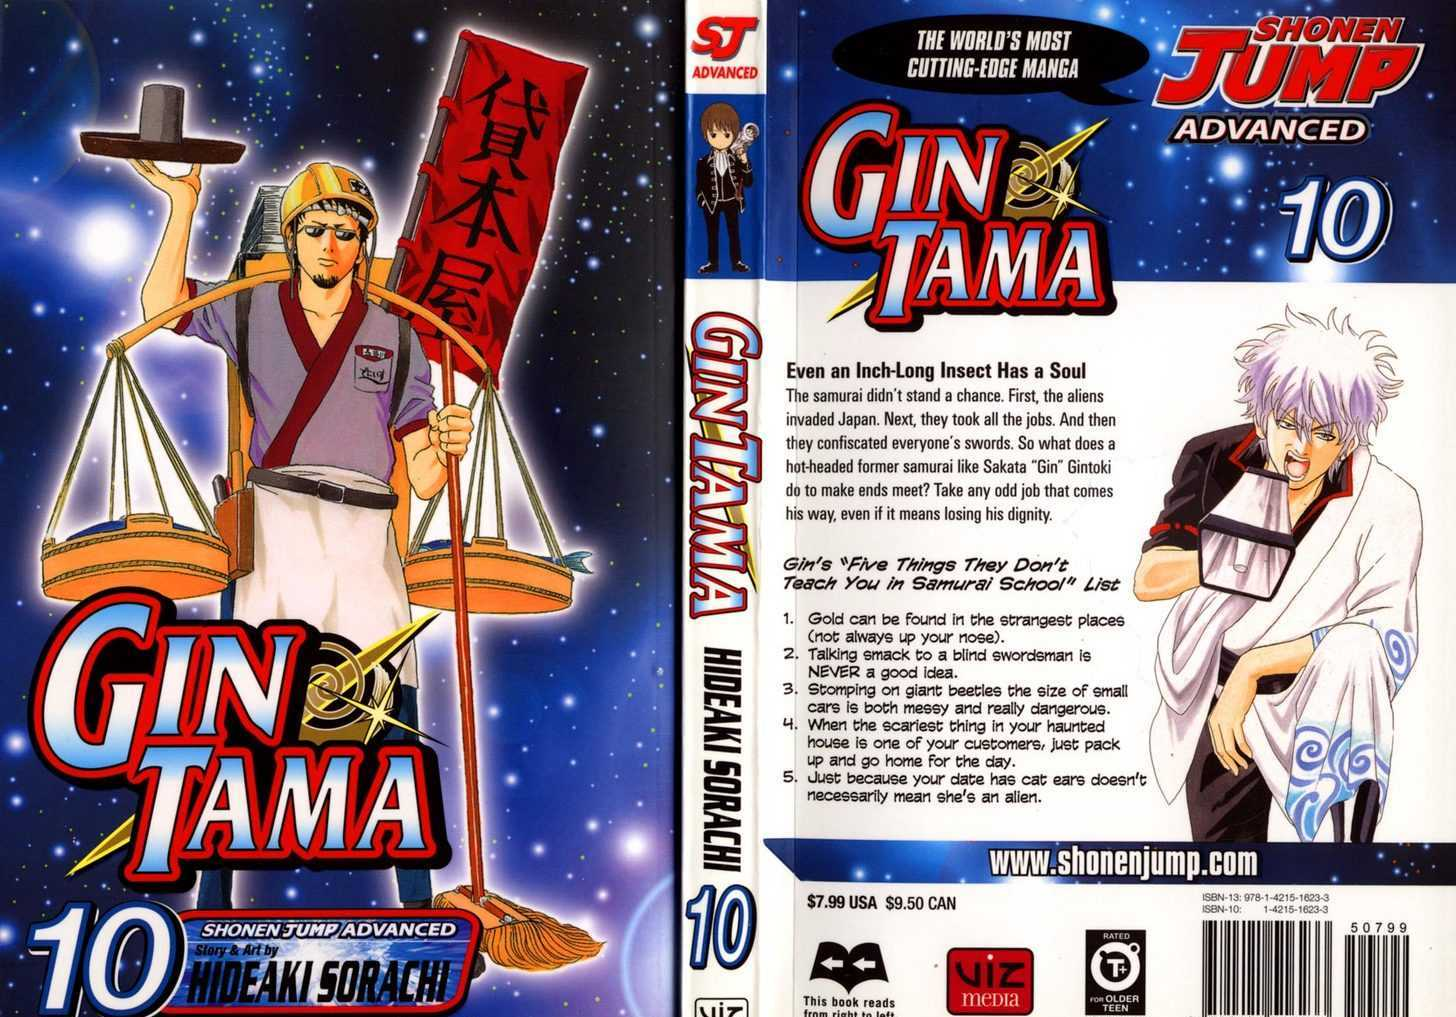 http://im.nineanime.com/comics/pic9/18/210/16361/Gintama770155.jpg Page 1